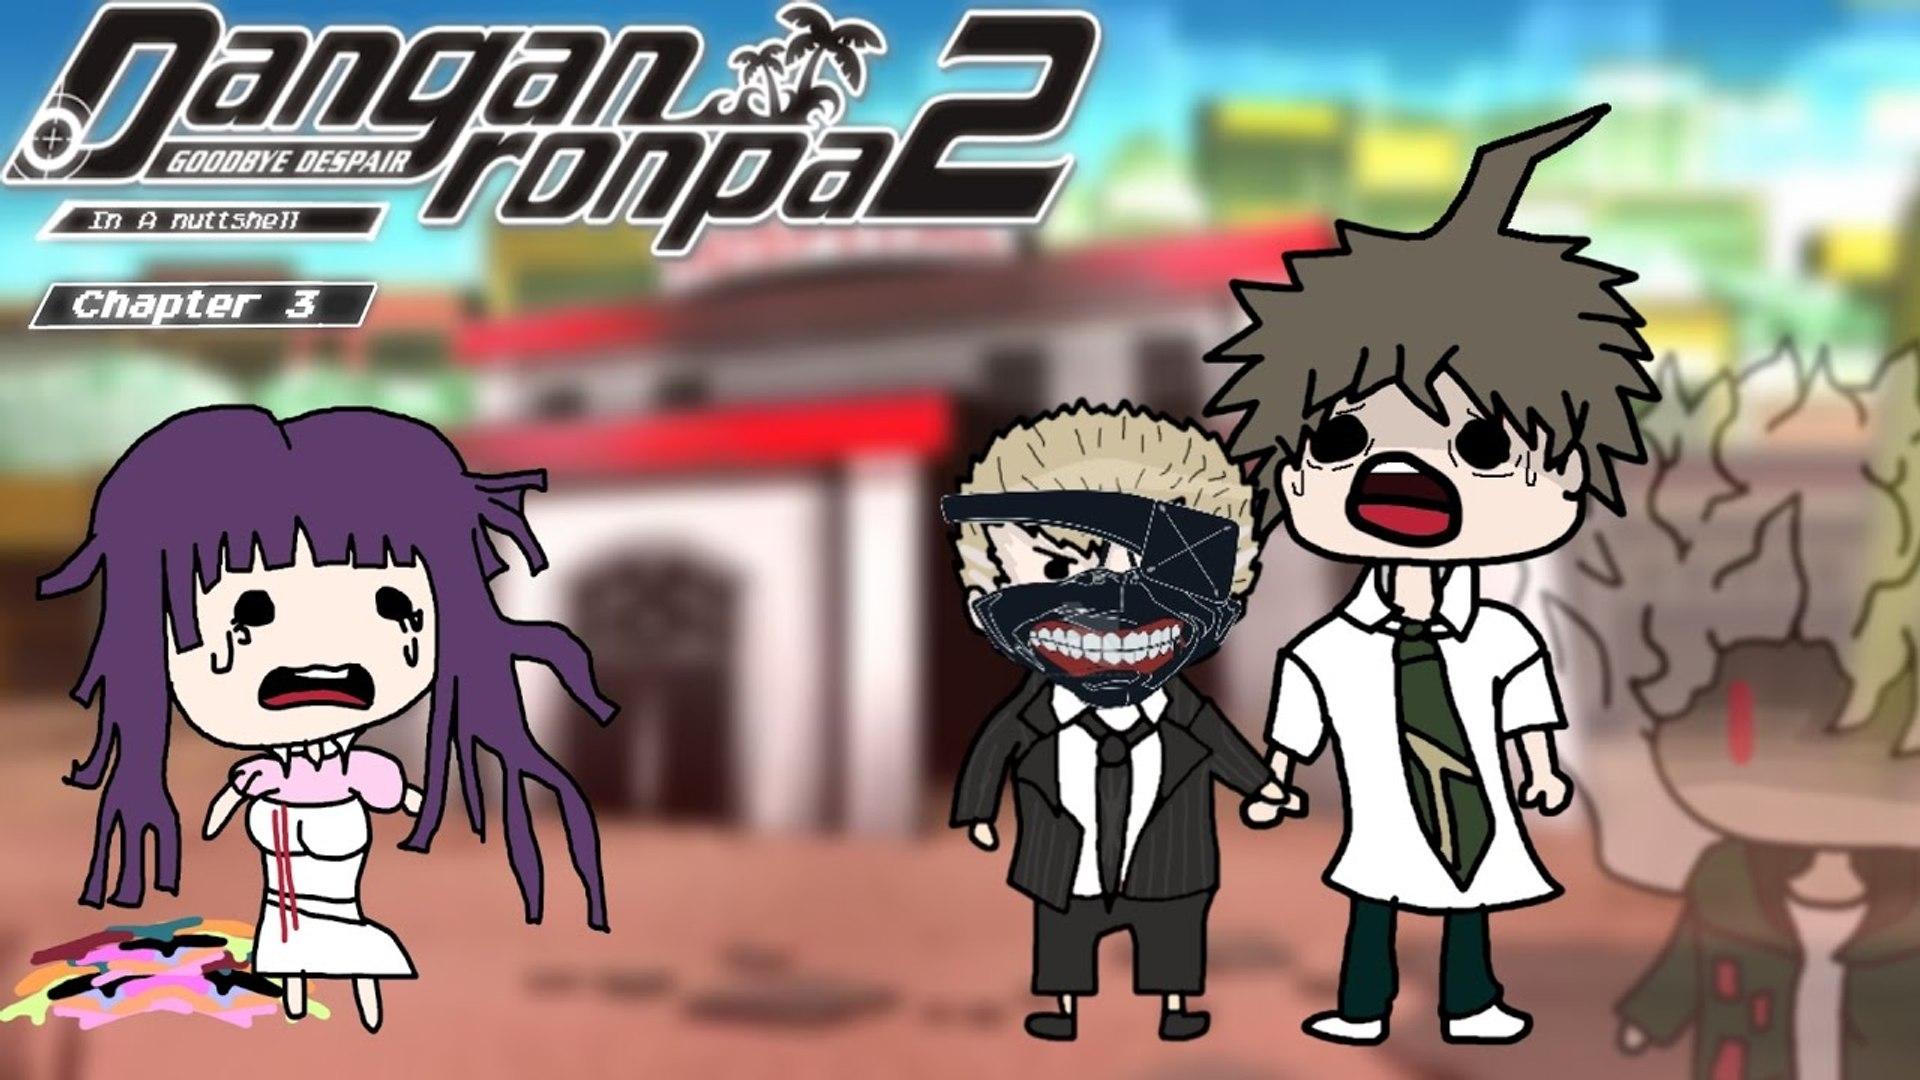 Danganronpa 2: Goodbye Despair In A Nuttshell - Chapter 3